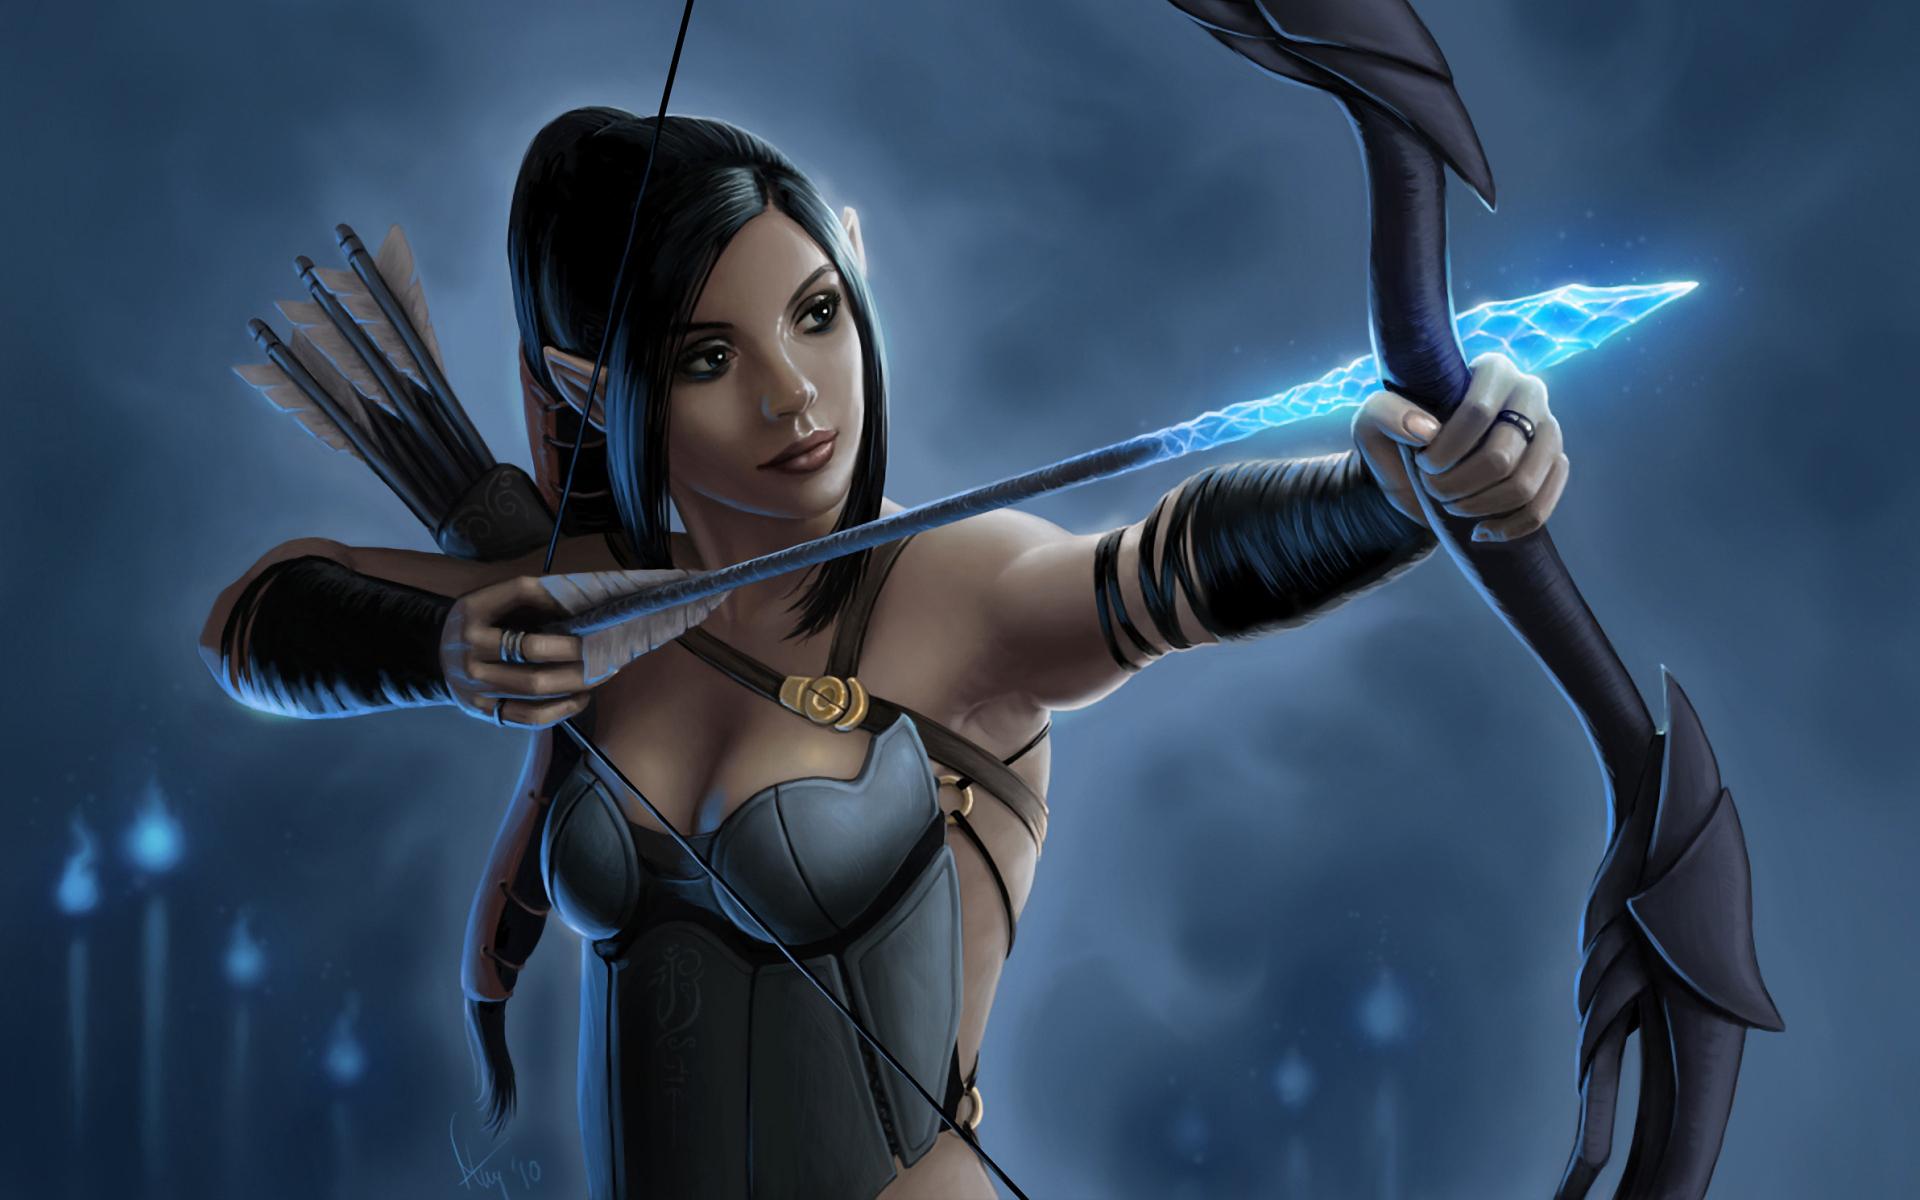 Fantasy Art Elves Wallpapers Hd Desktop And Mobile: Elf Archer Full HD Wallpaper And Background Image